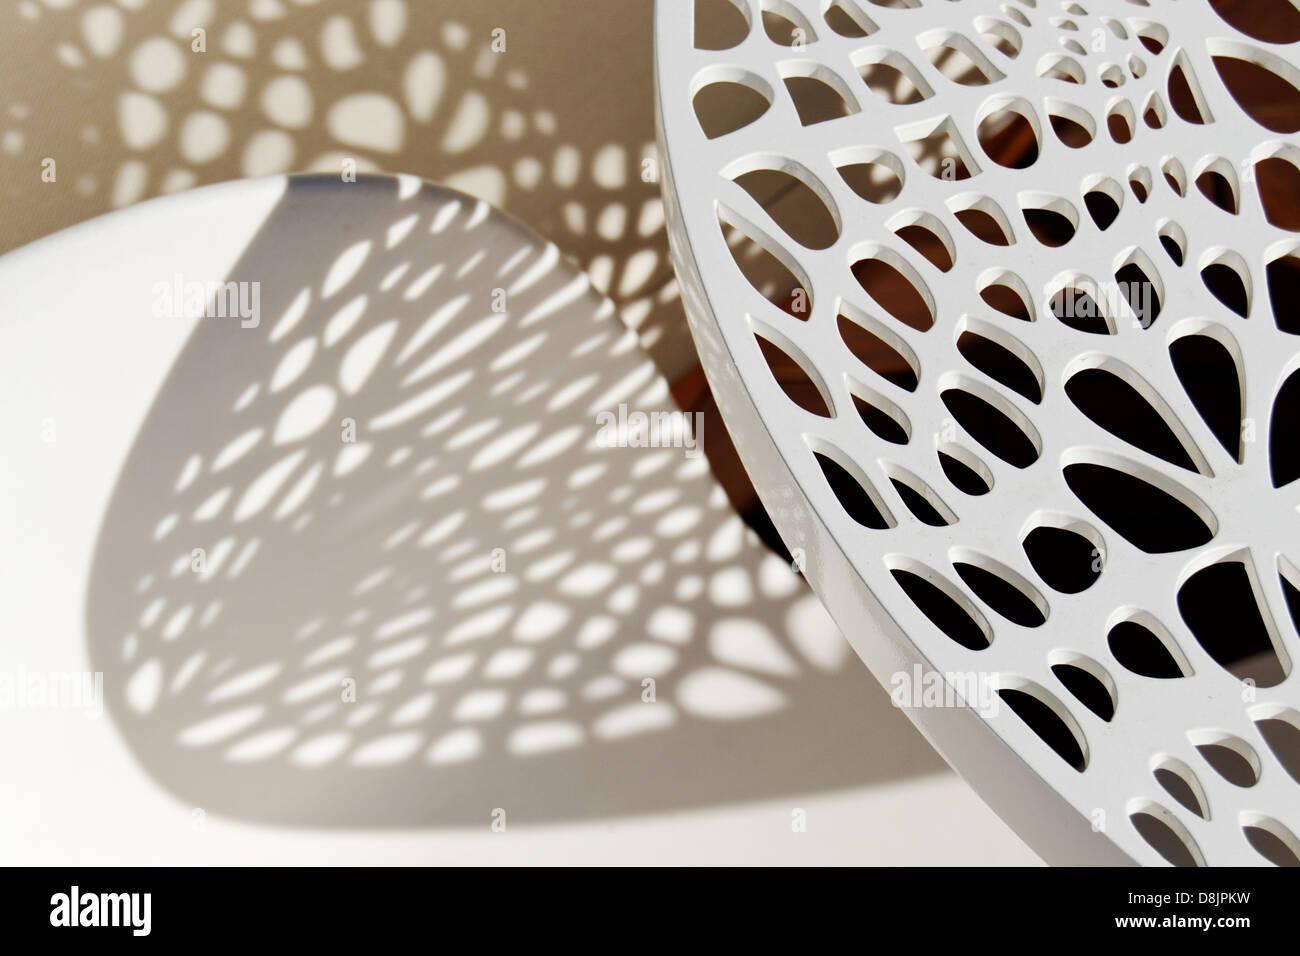 Interior, Lifestyle, Barcelona, Spain - Stock Image